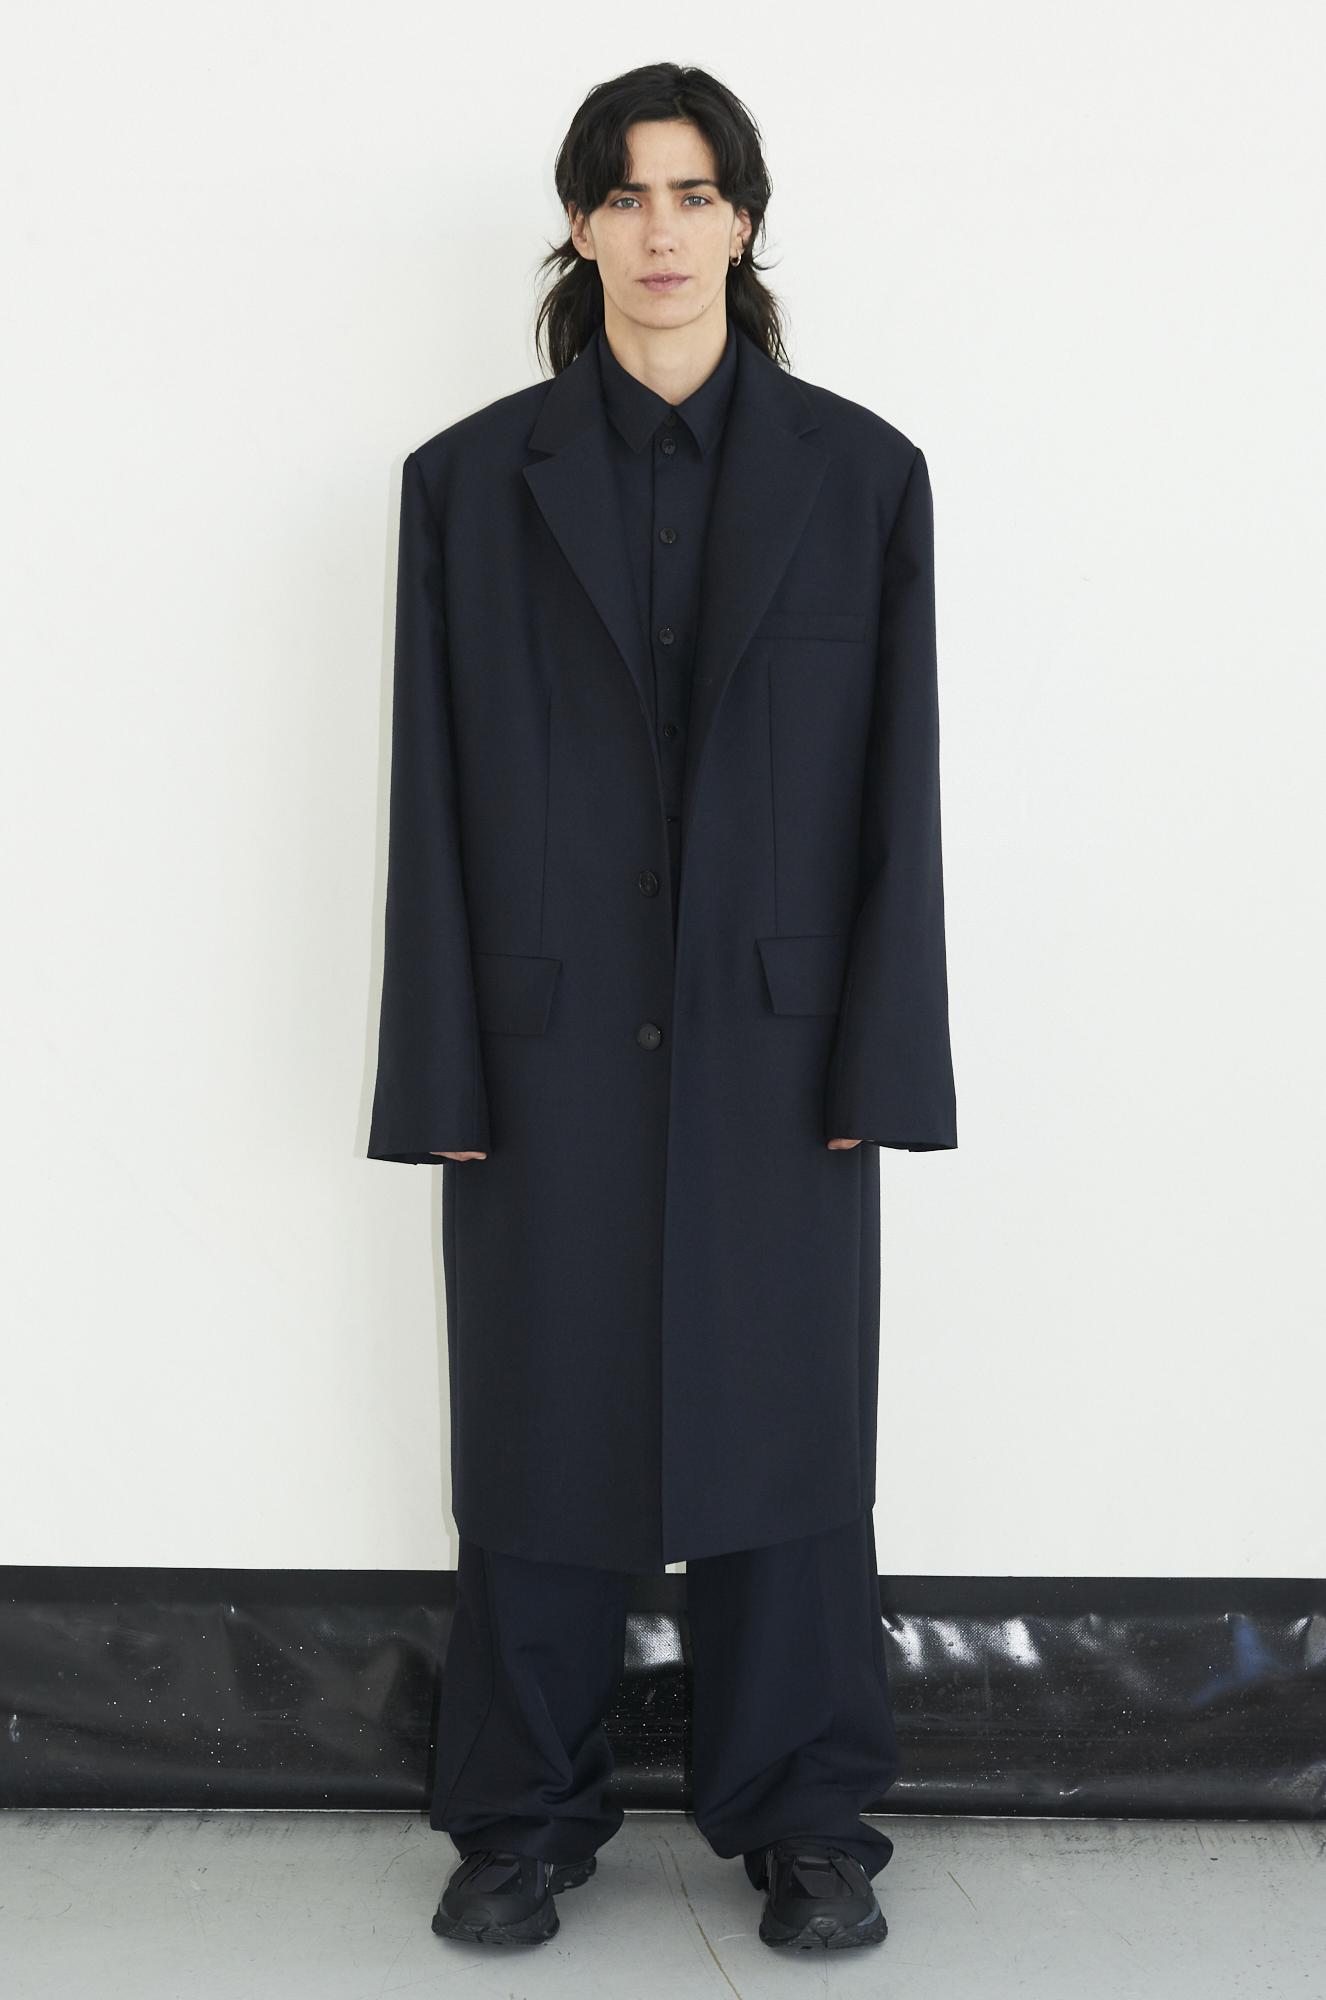 GAUCHERE Fall Winter 2021 Paris Fashion Week LOOK 19 Coat THEDA, Shirt TOYAH, Trousers TIRIE